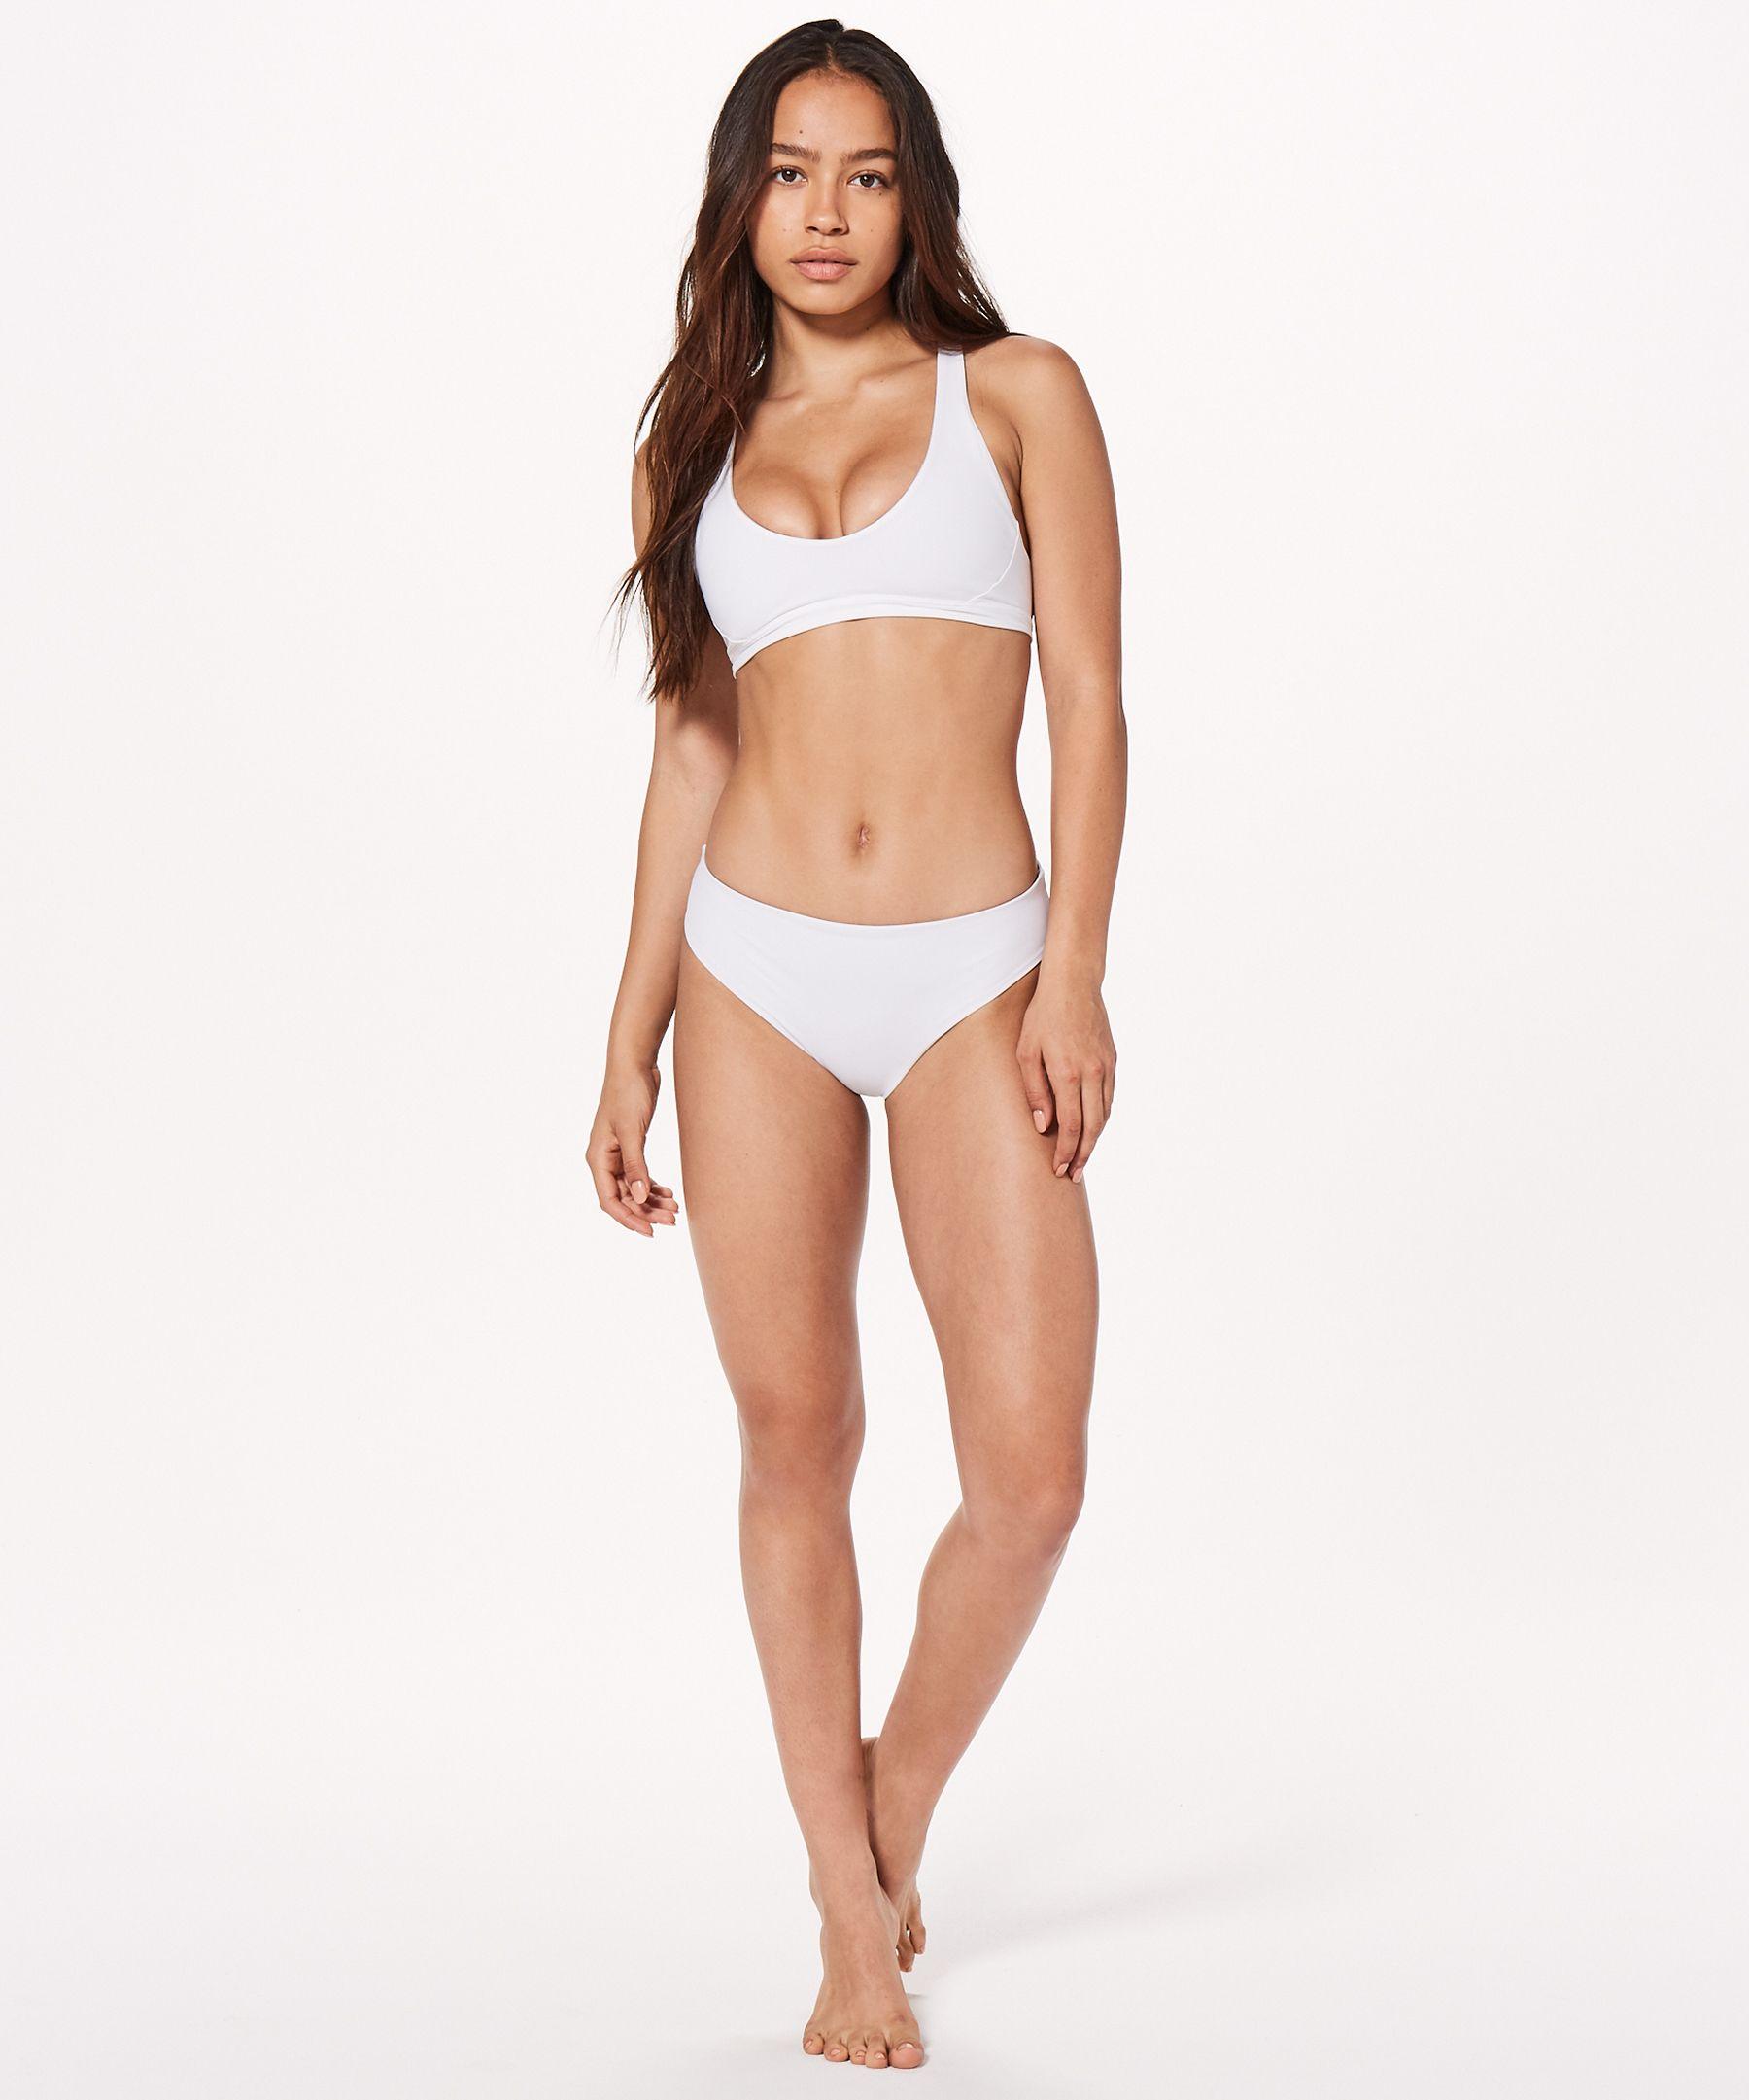 f01c8486c038f Rising tides bottom womens swim bottoms lululemon athletica jpg 640x768  Navy bllue lululemon bikini